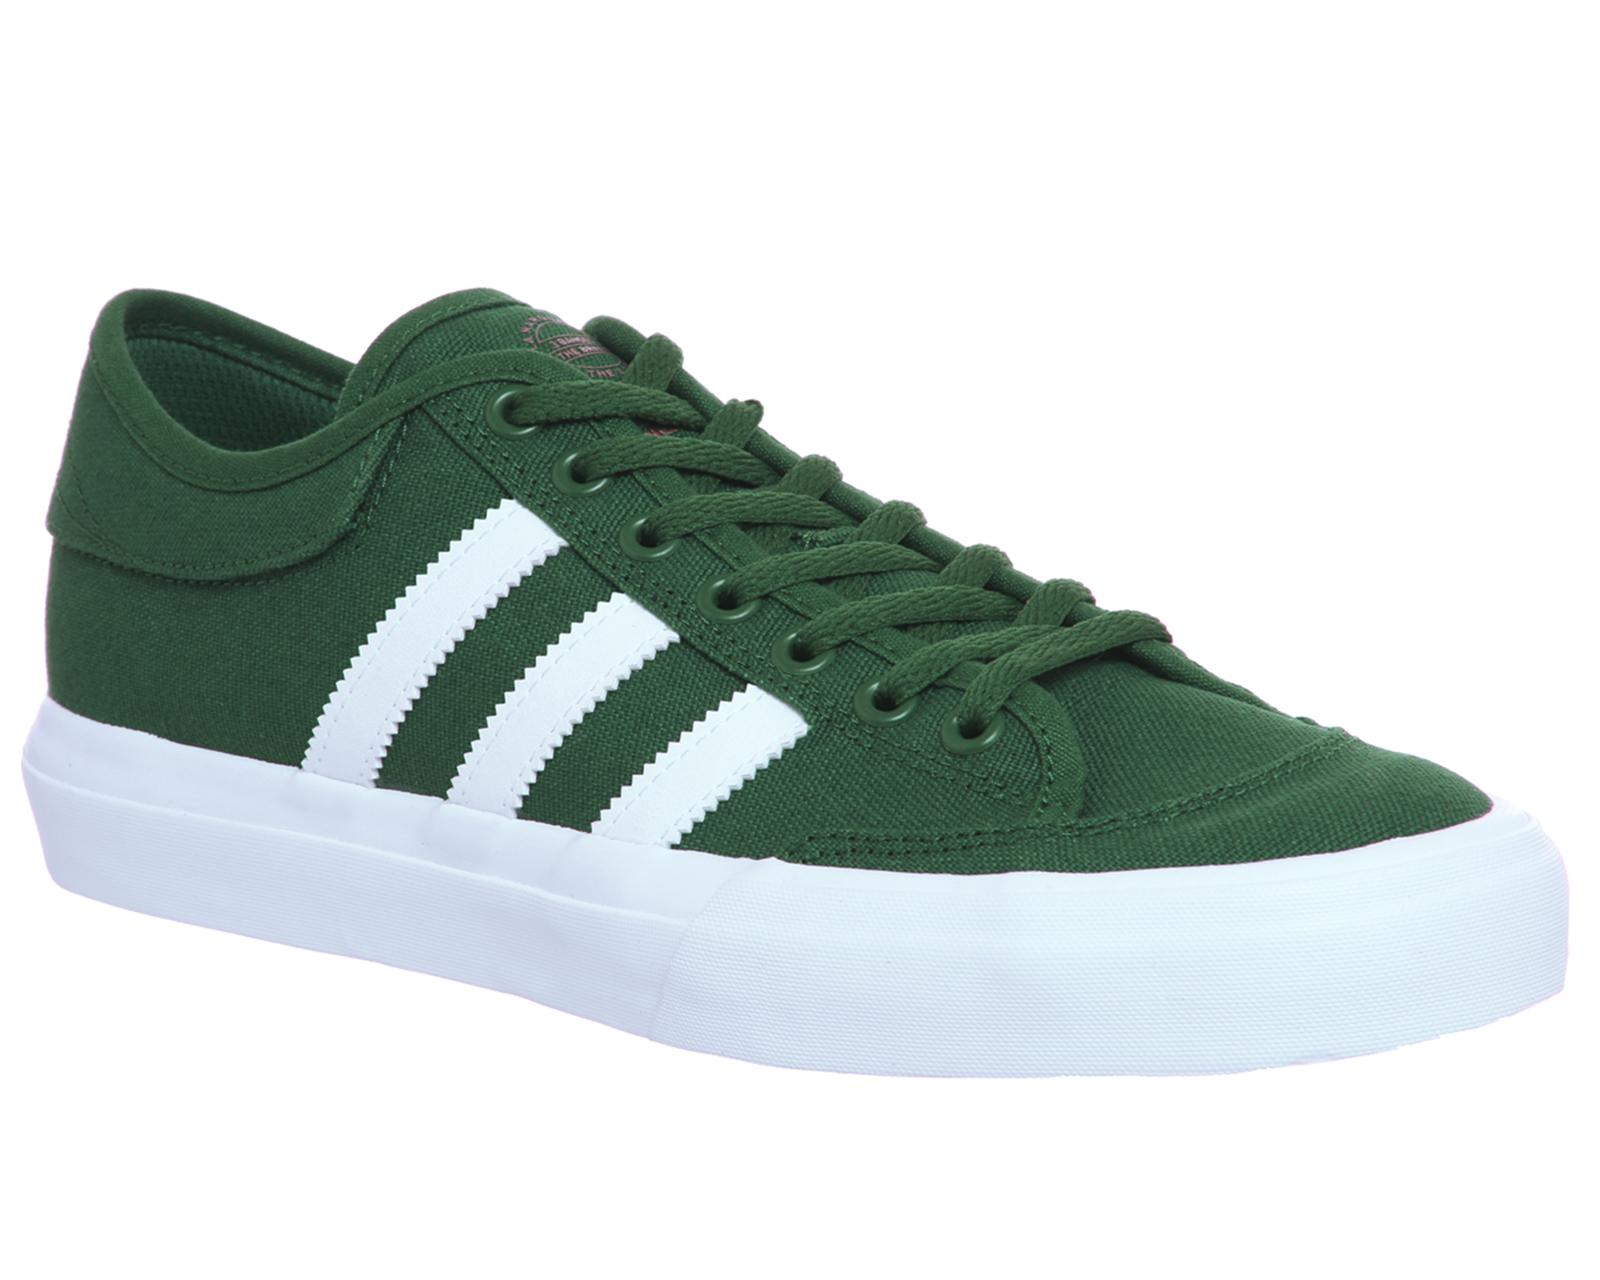 wholesale dealer e7f2c e27bf SENTINEL Scarpe Adidas Matchcourt istruttori gomma bianca verde nobile  formatori